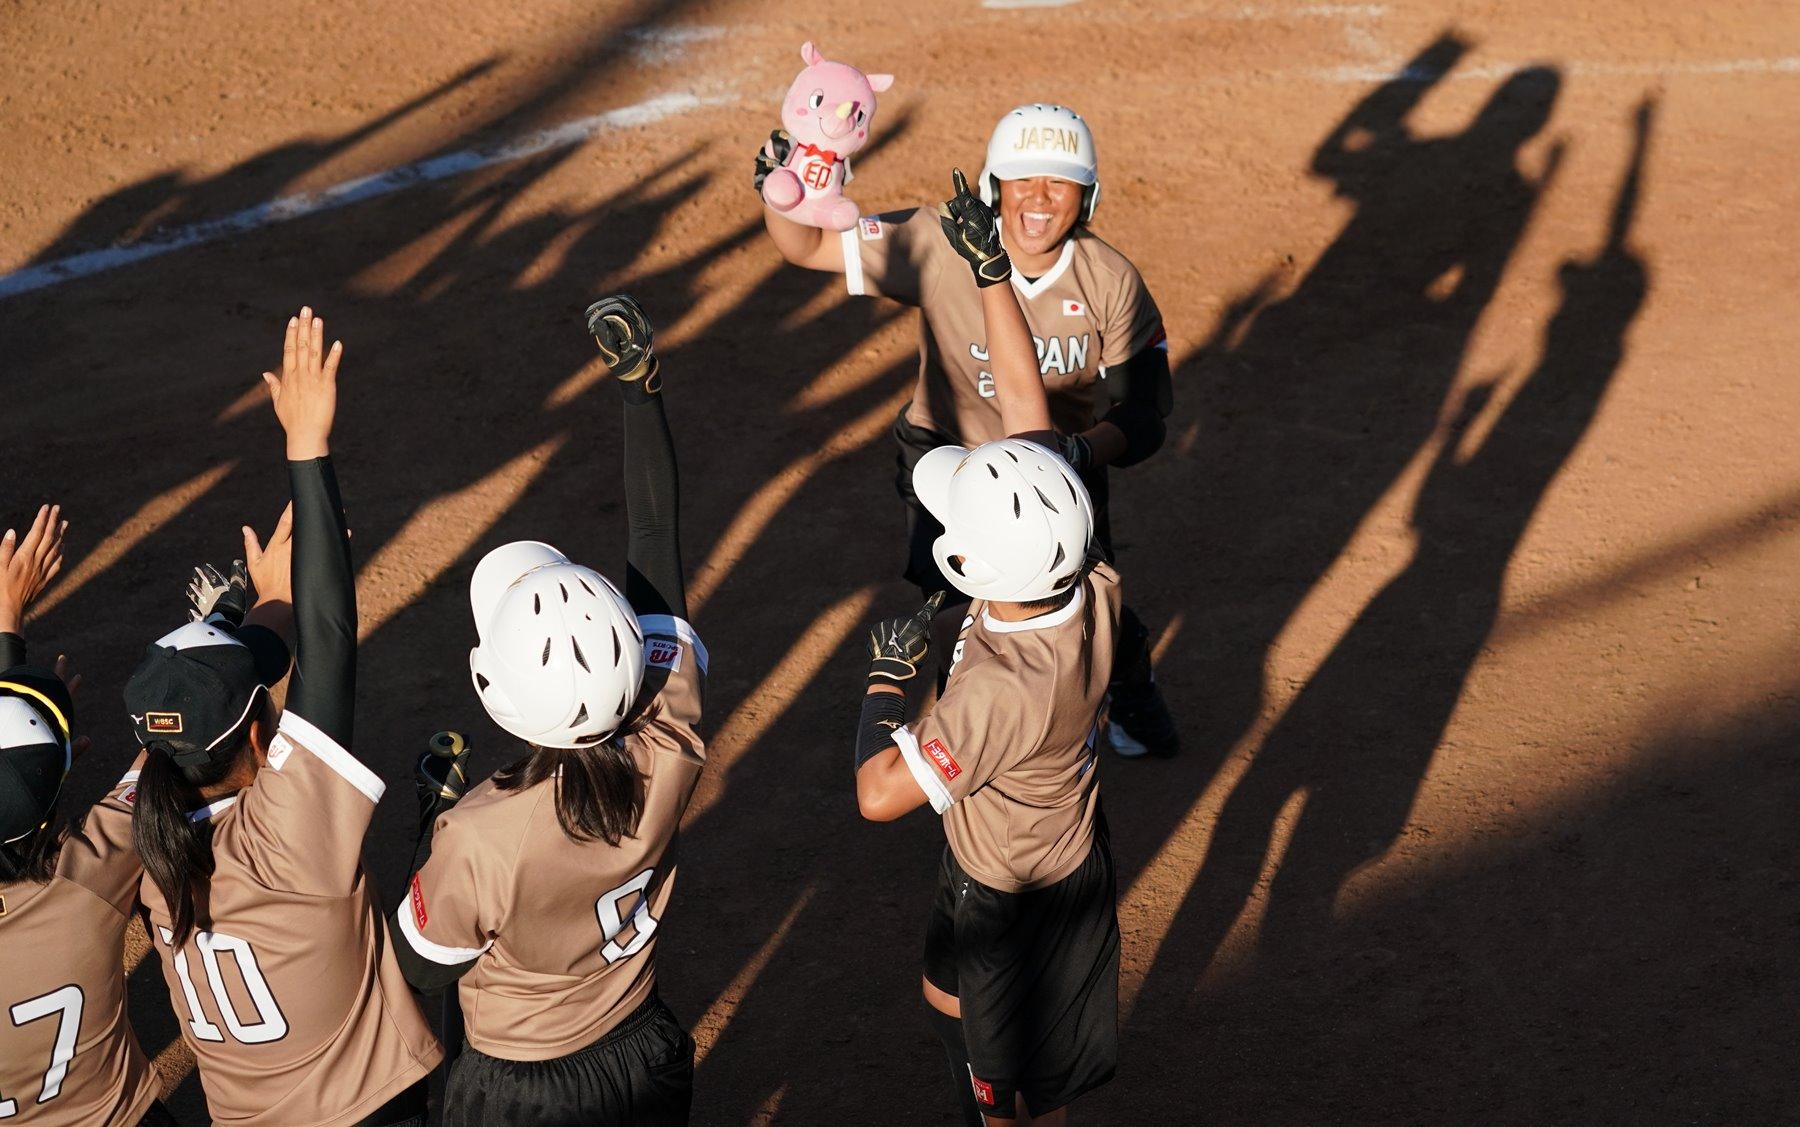 Catcher Haruki Sumitani celebrated after her home run